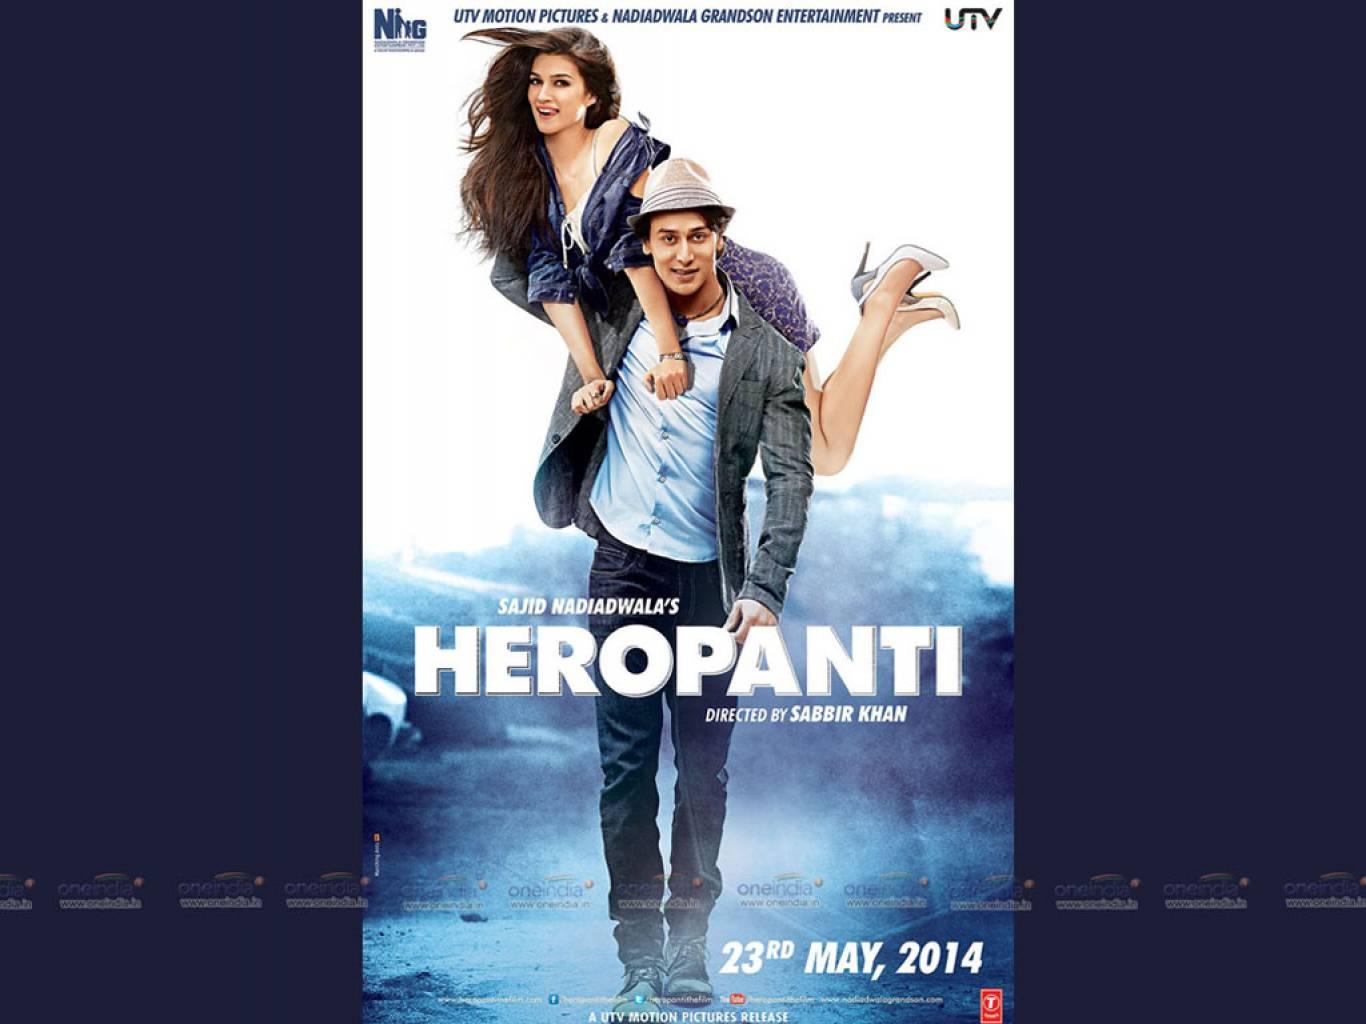 heropanti full movie hd free download